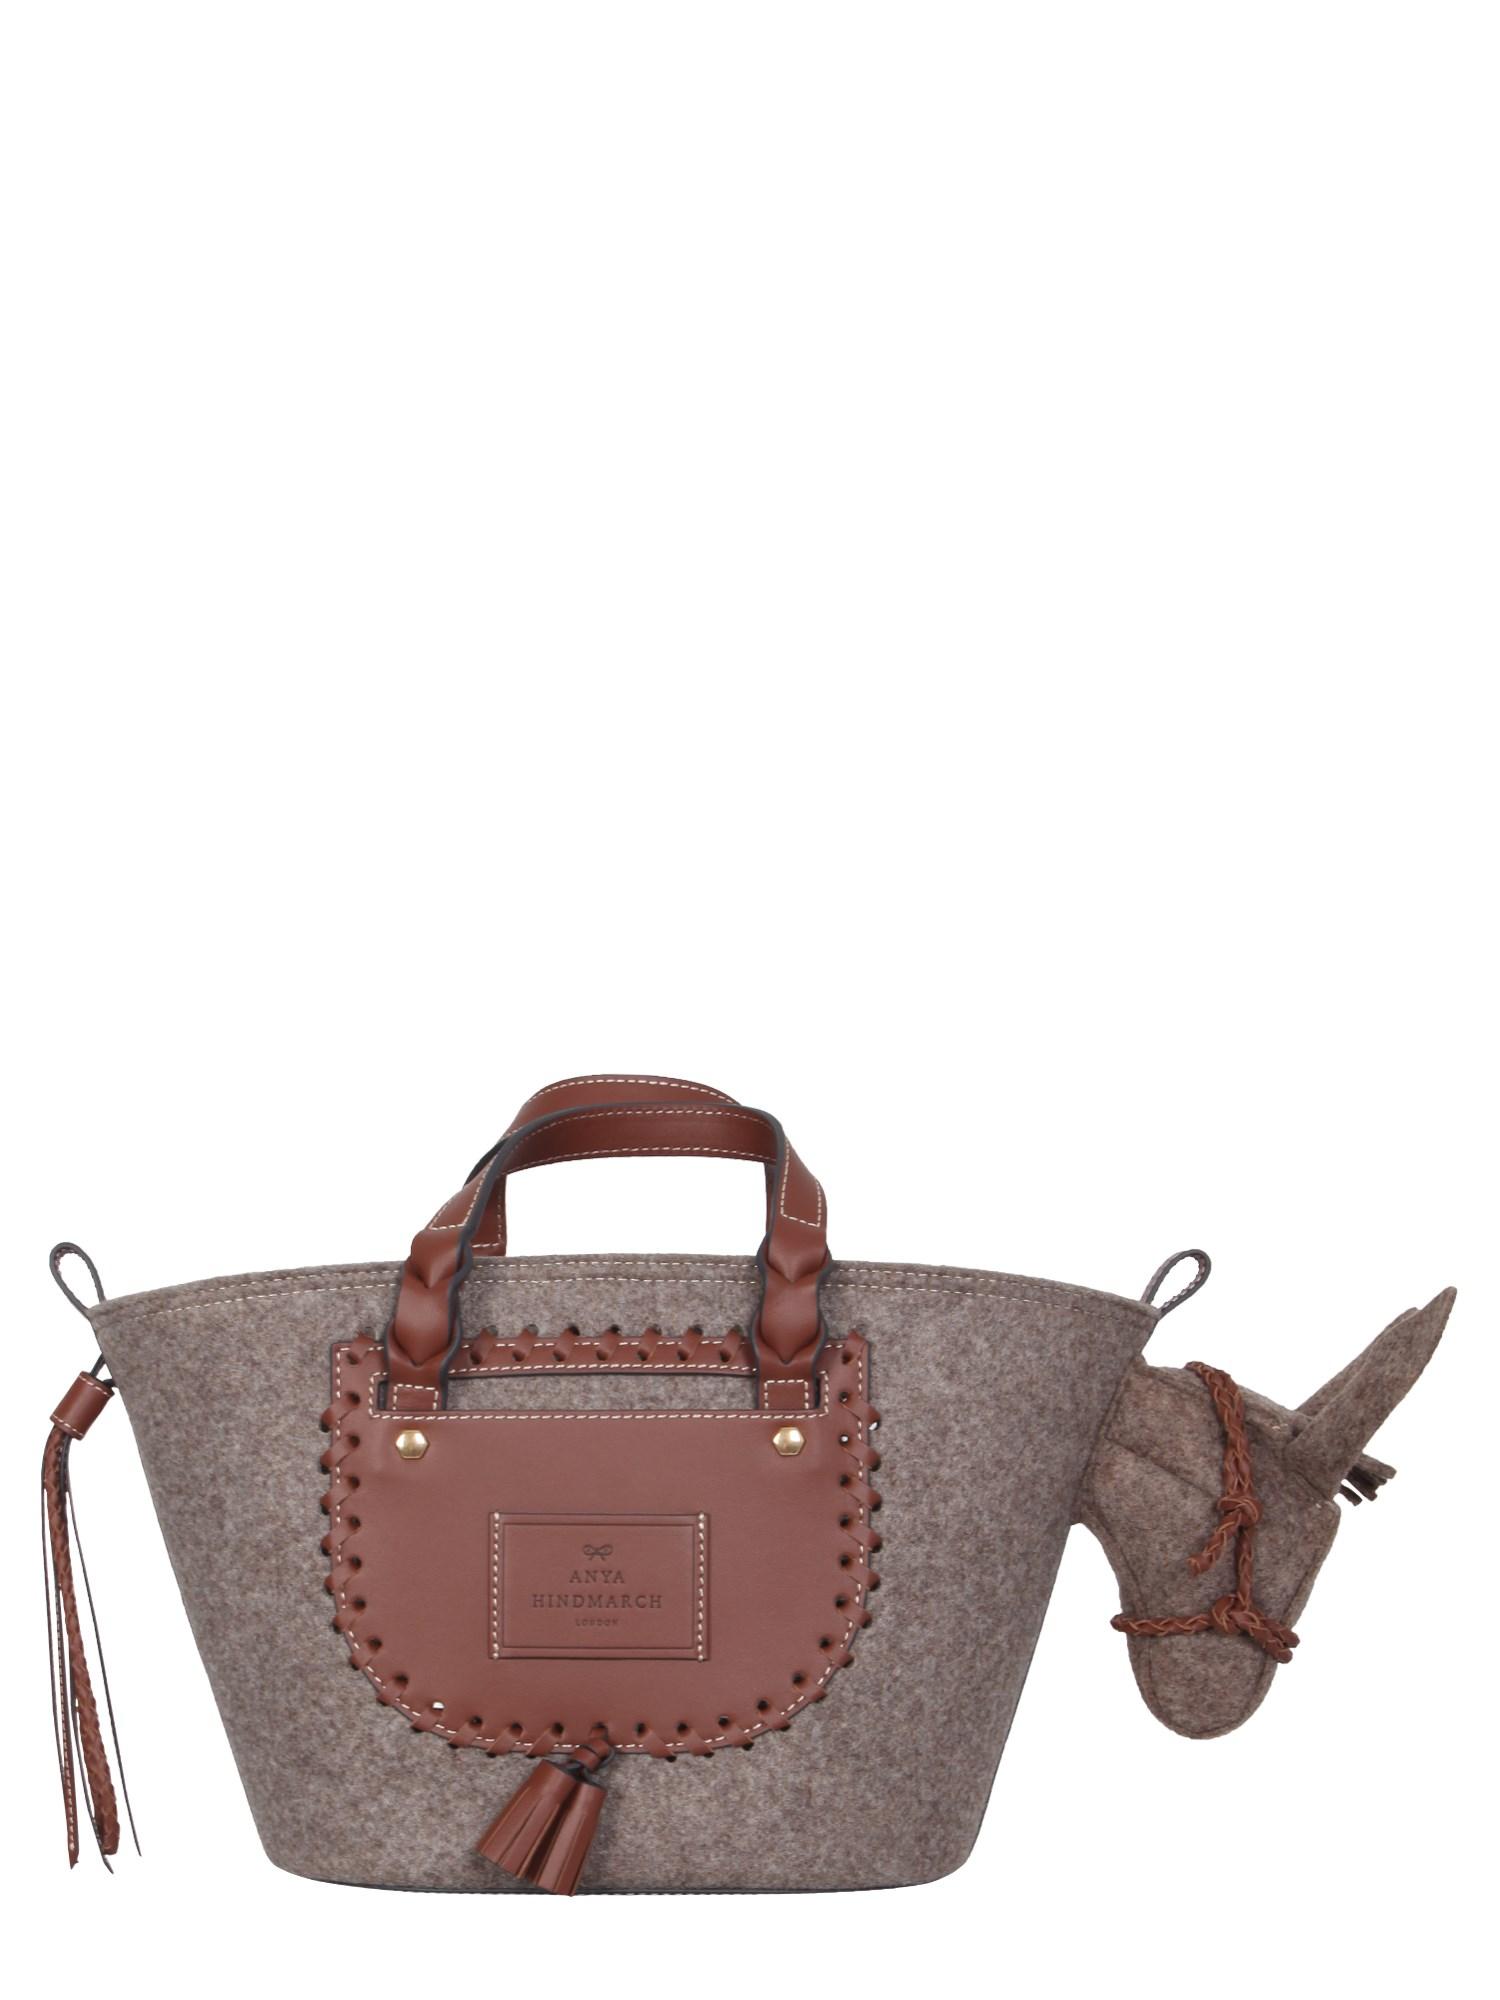 Small tote donkey bag - anya hindmarch - Modalova